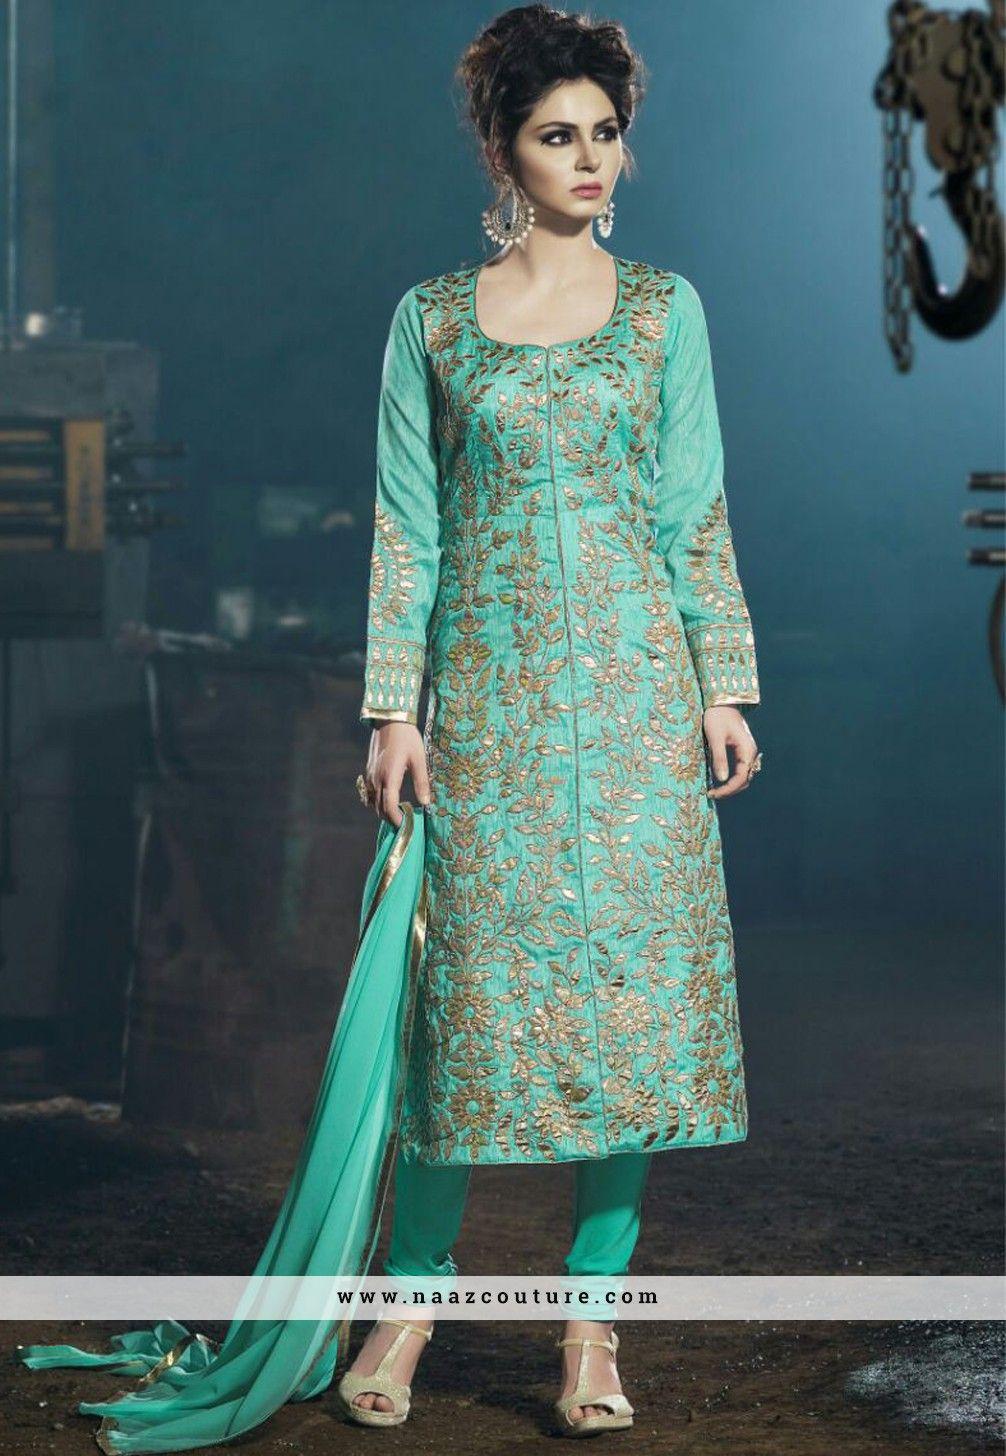 indian wedding dresses salwar kameez | Wedding